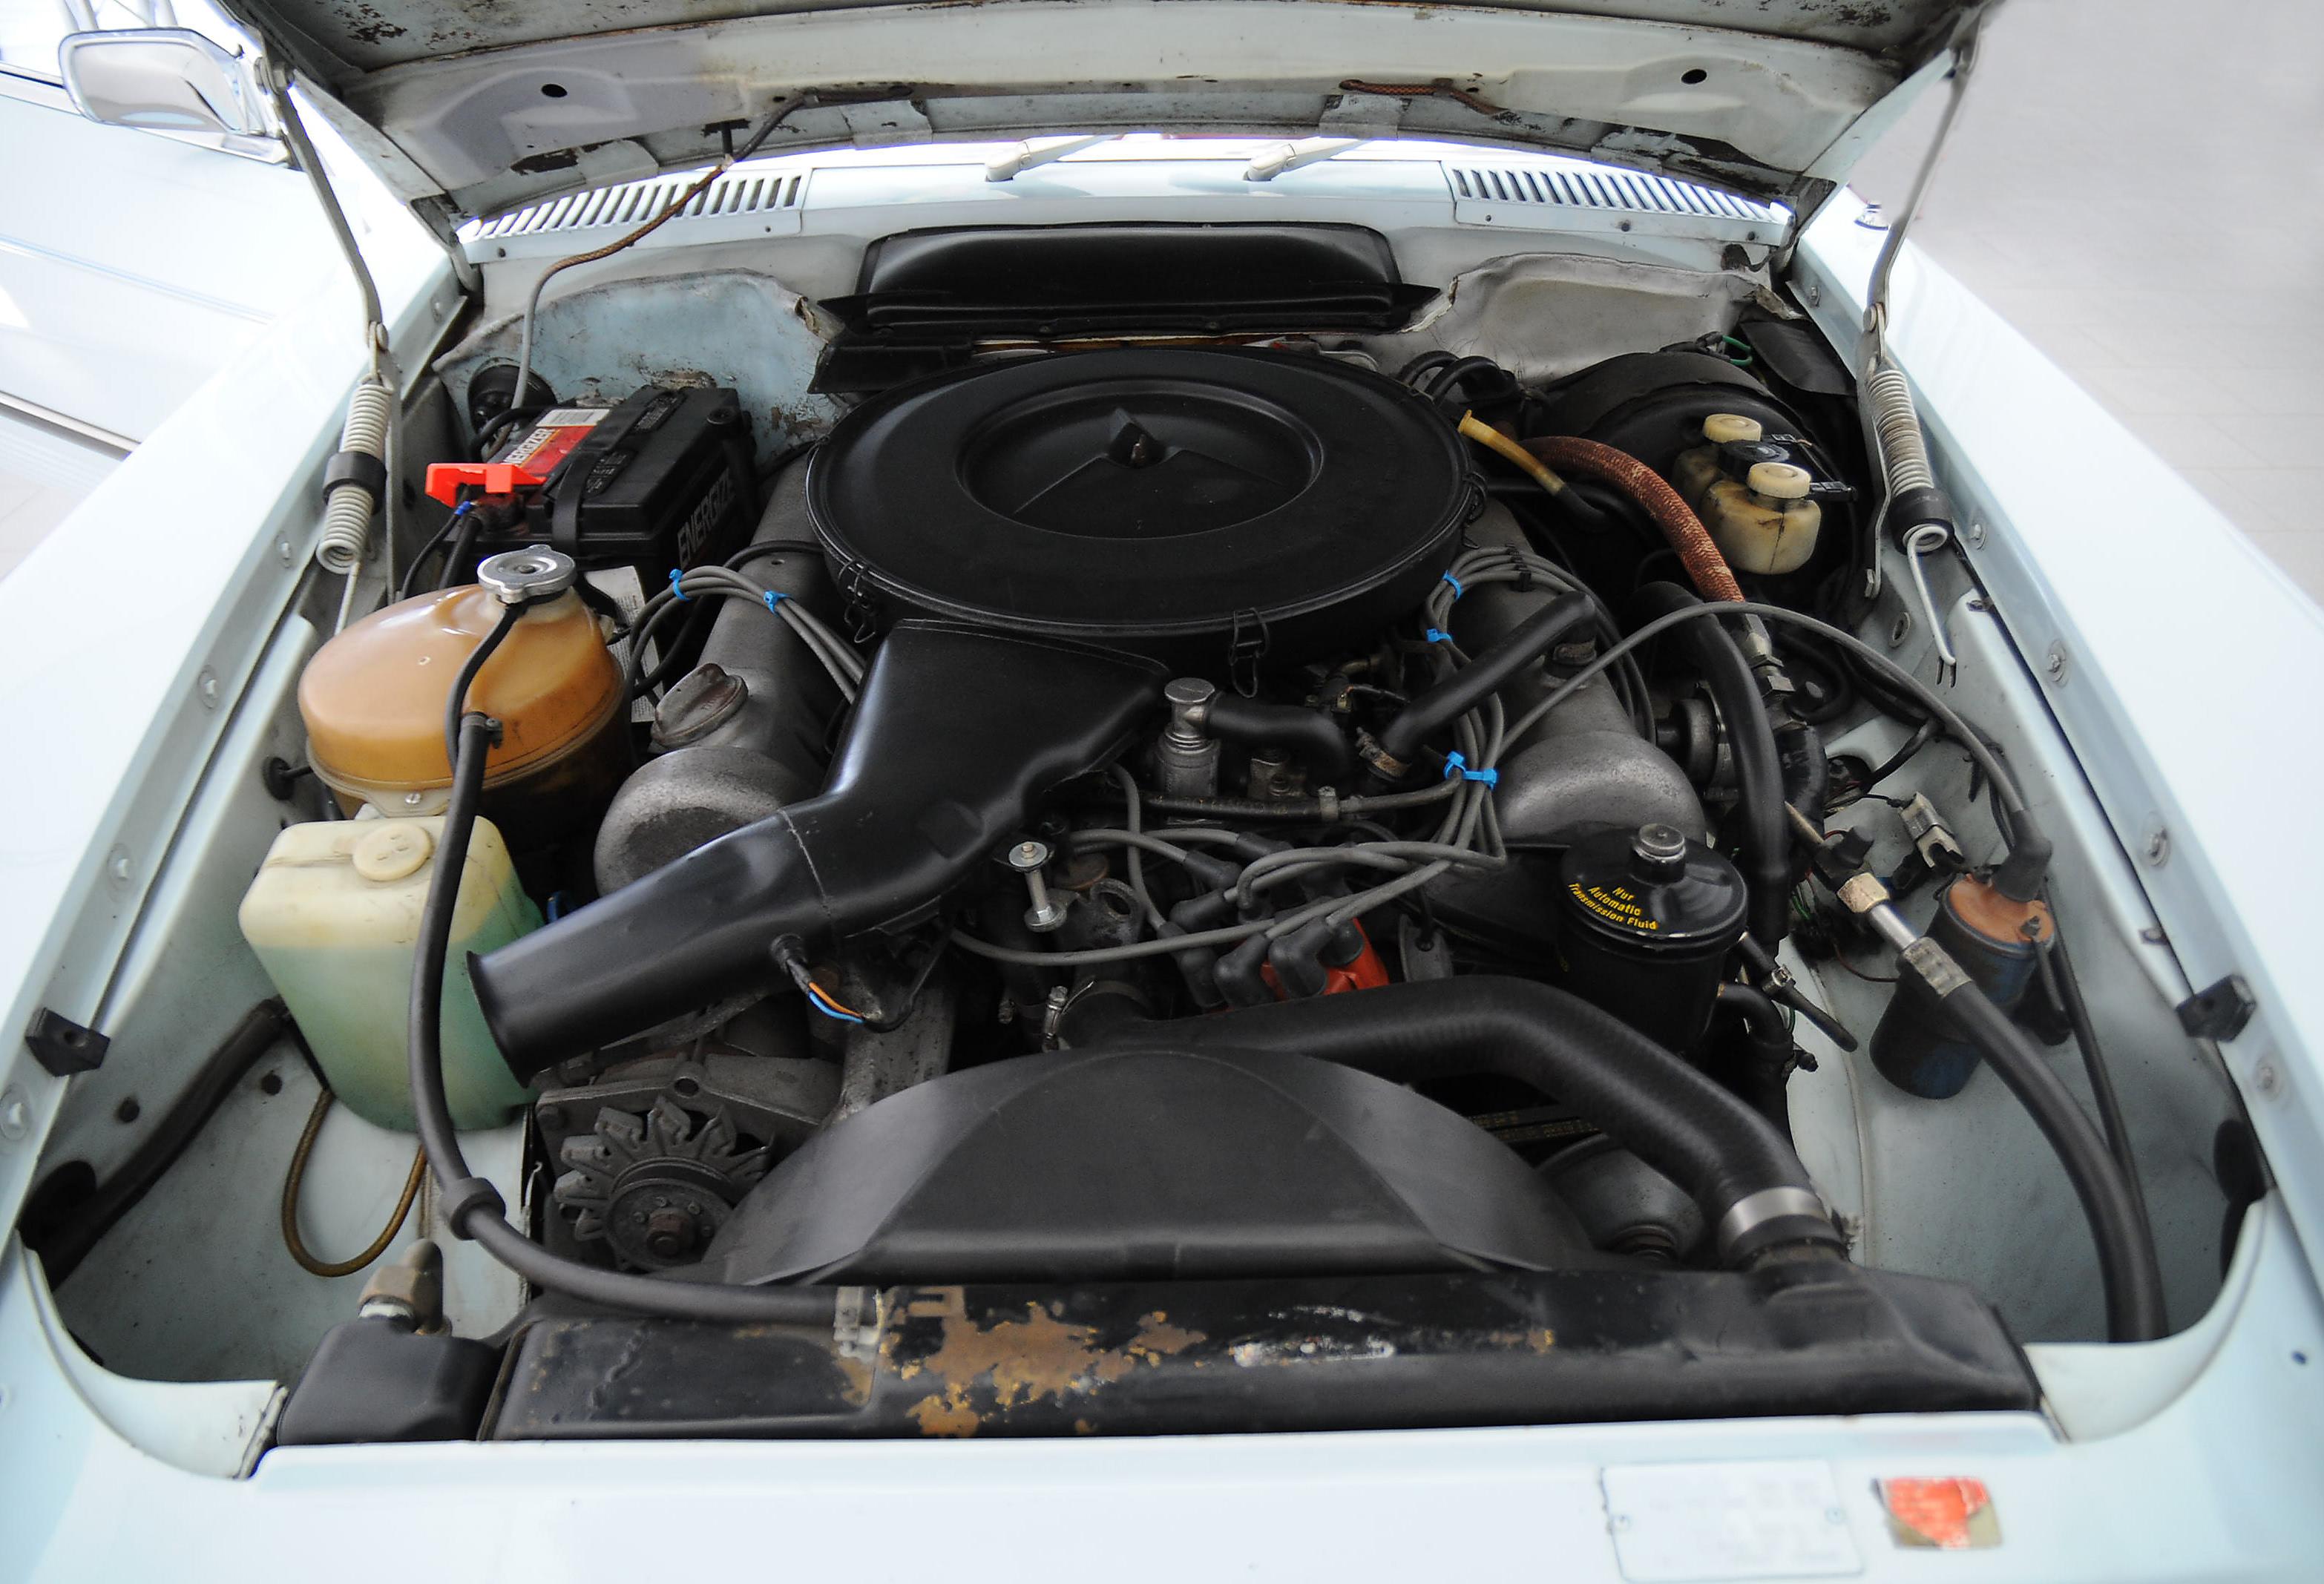 Mercedes Benz 450 Sl Classicbid M117 Engine